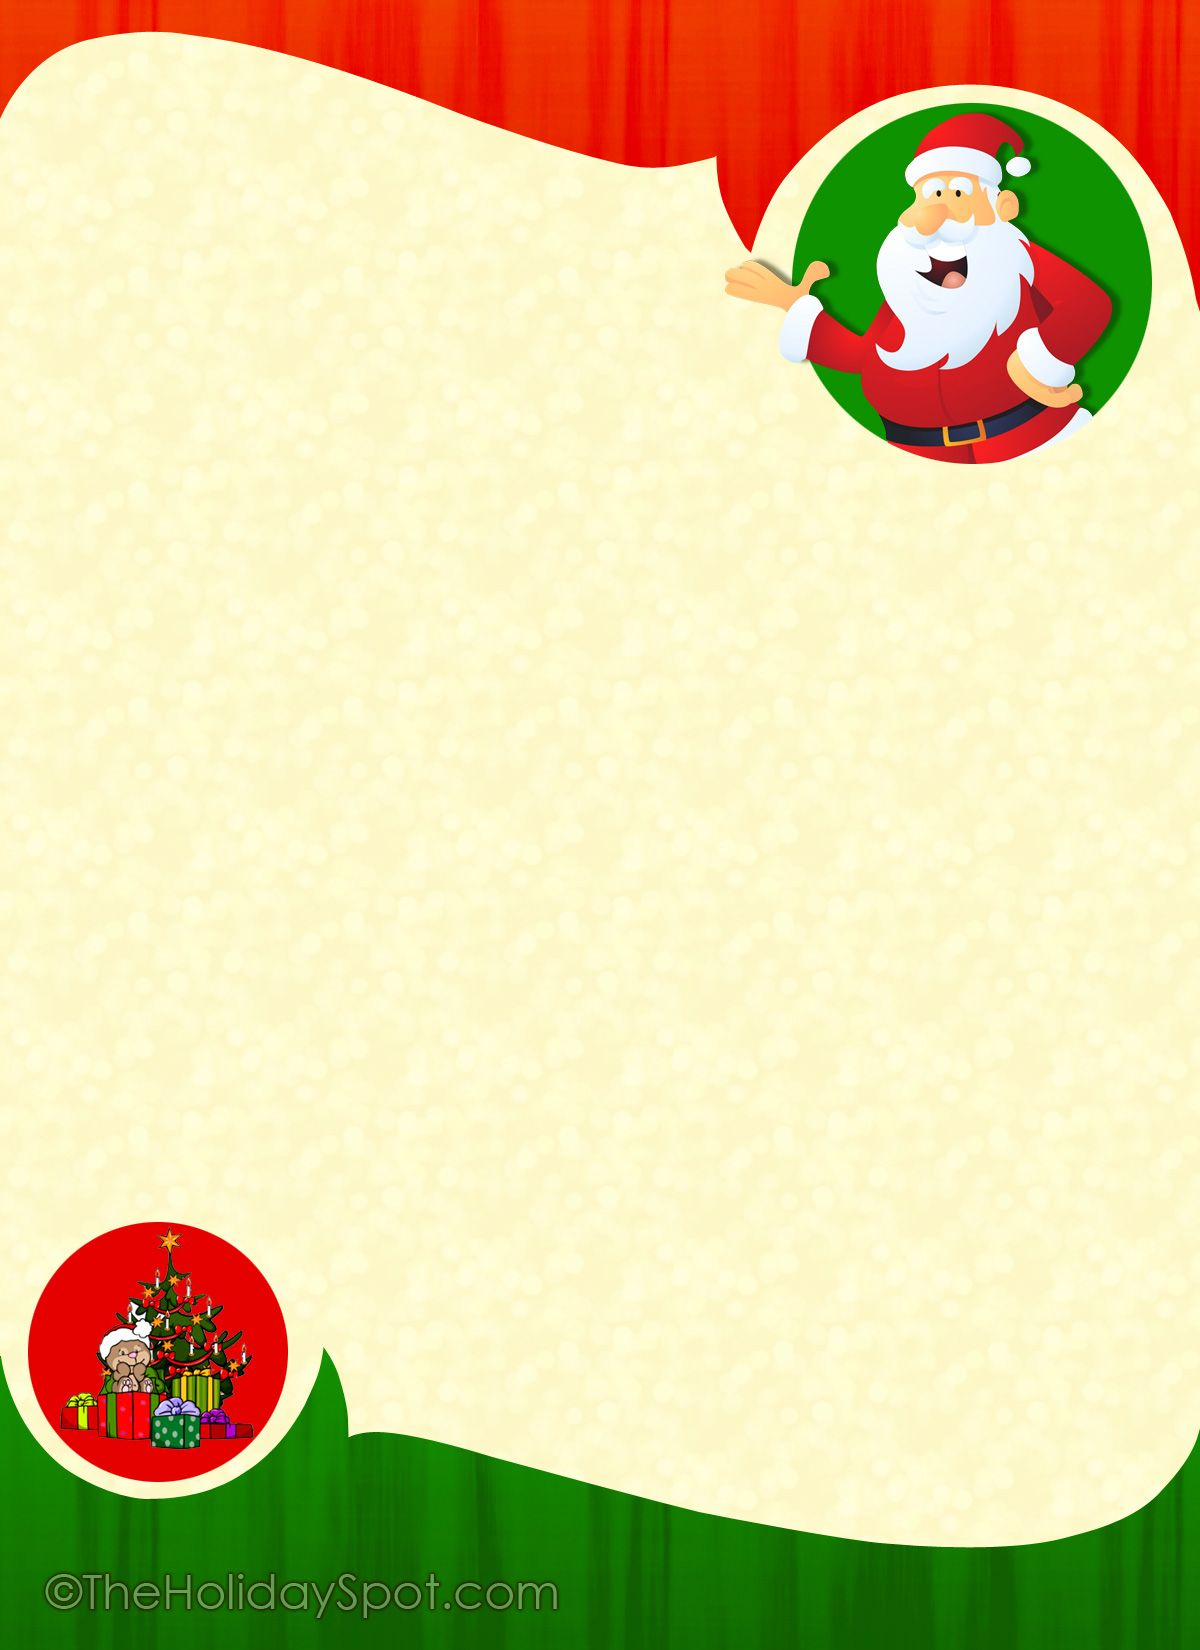 Free Printable Christmas Borders For Letters Google